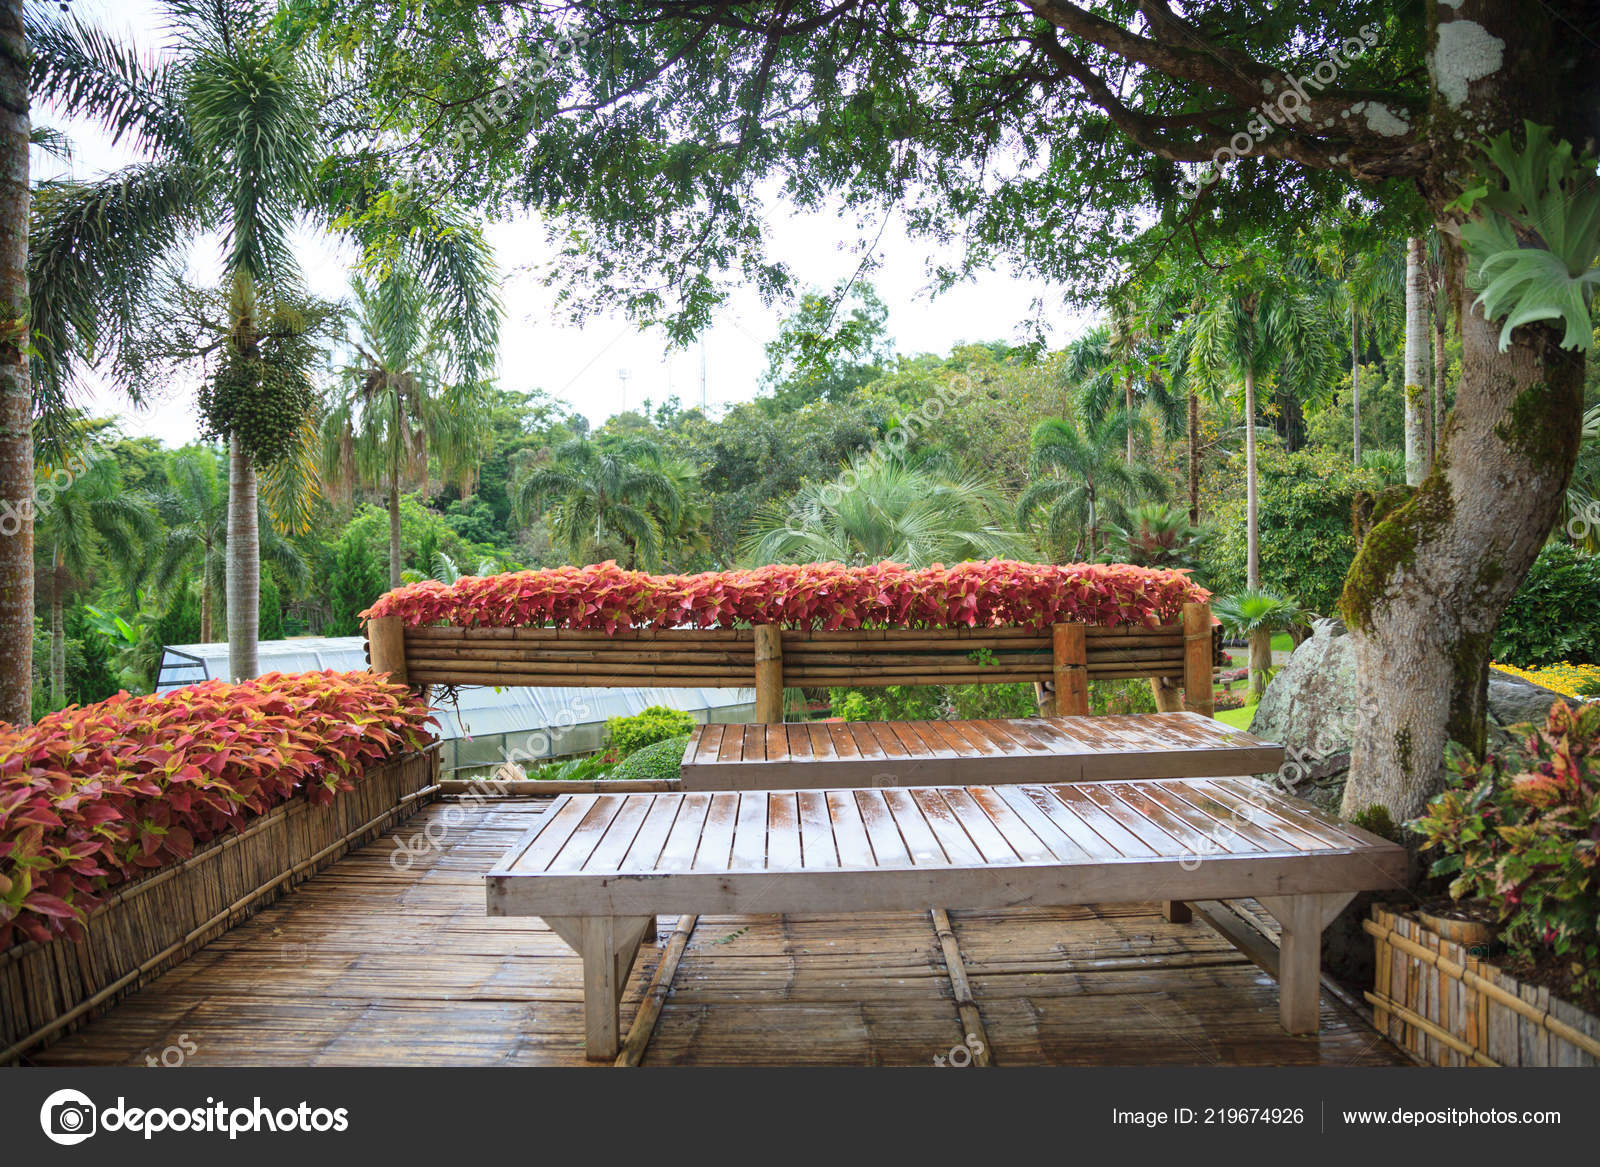 Gîte Rural Tropical Maison Jardin Bambou Bois Sur Balcon Terrasse ...